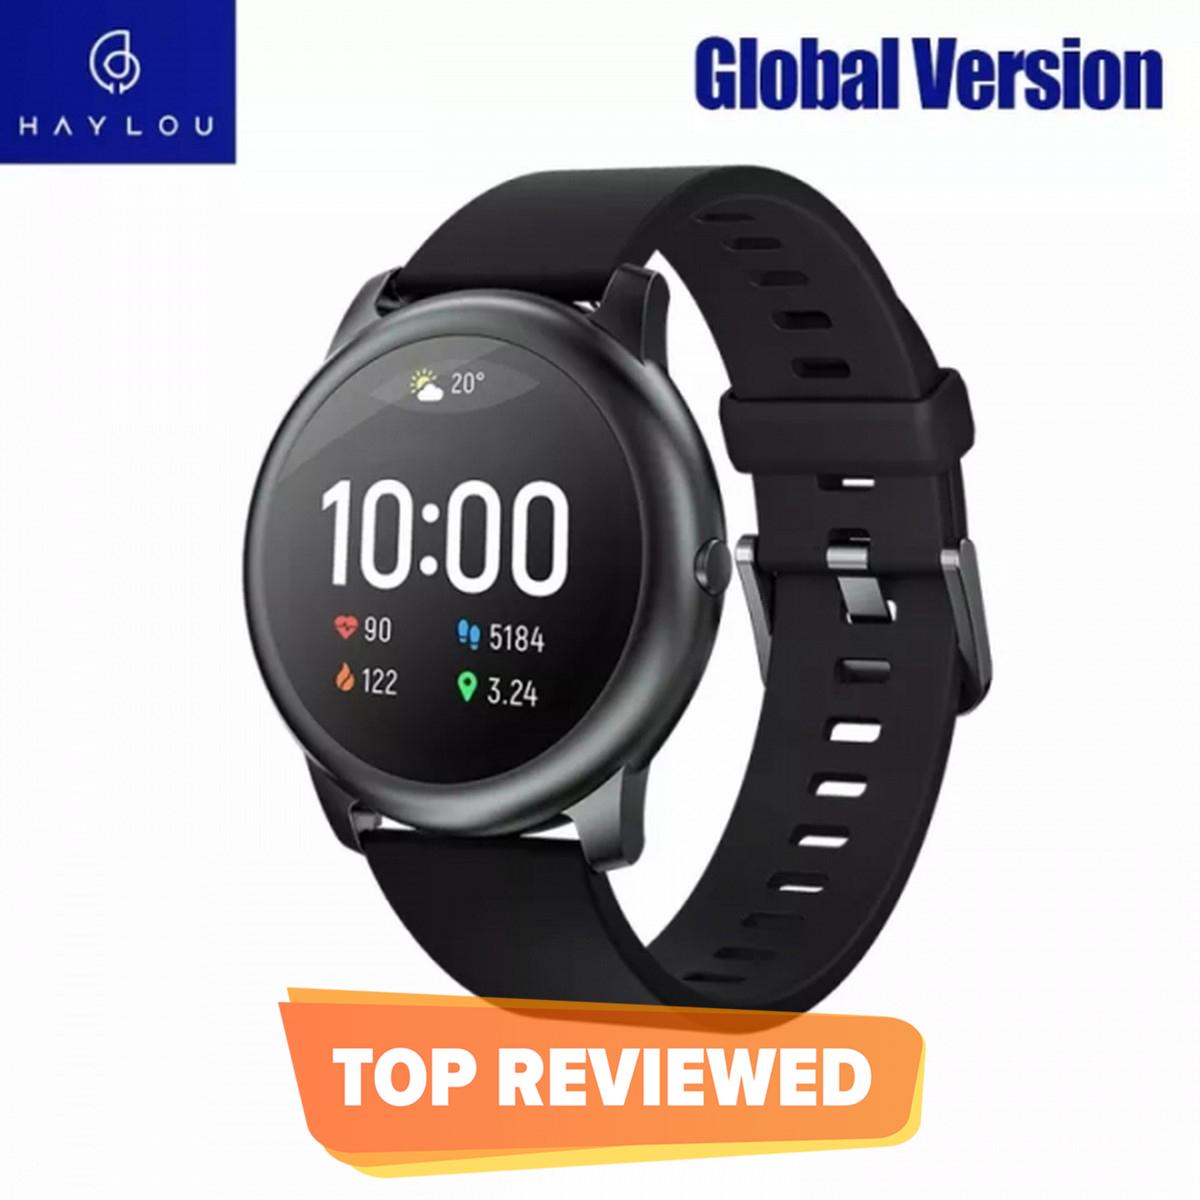 Haylou Solar LS05 Global Version